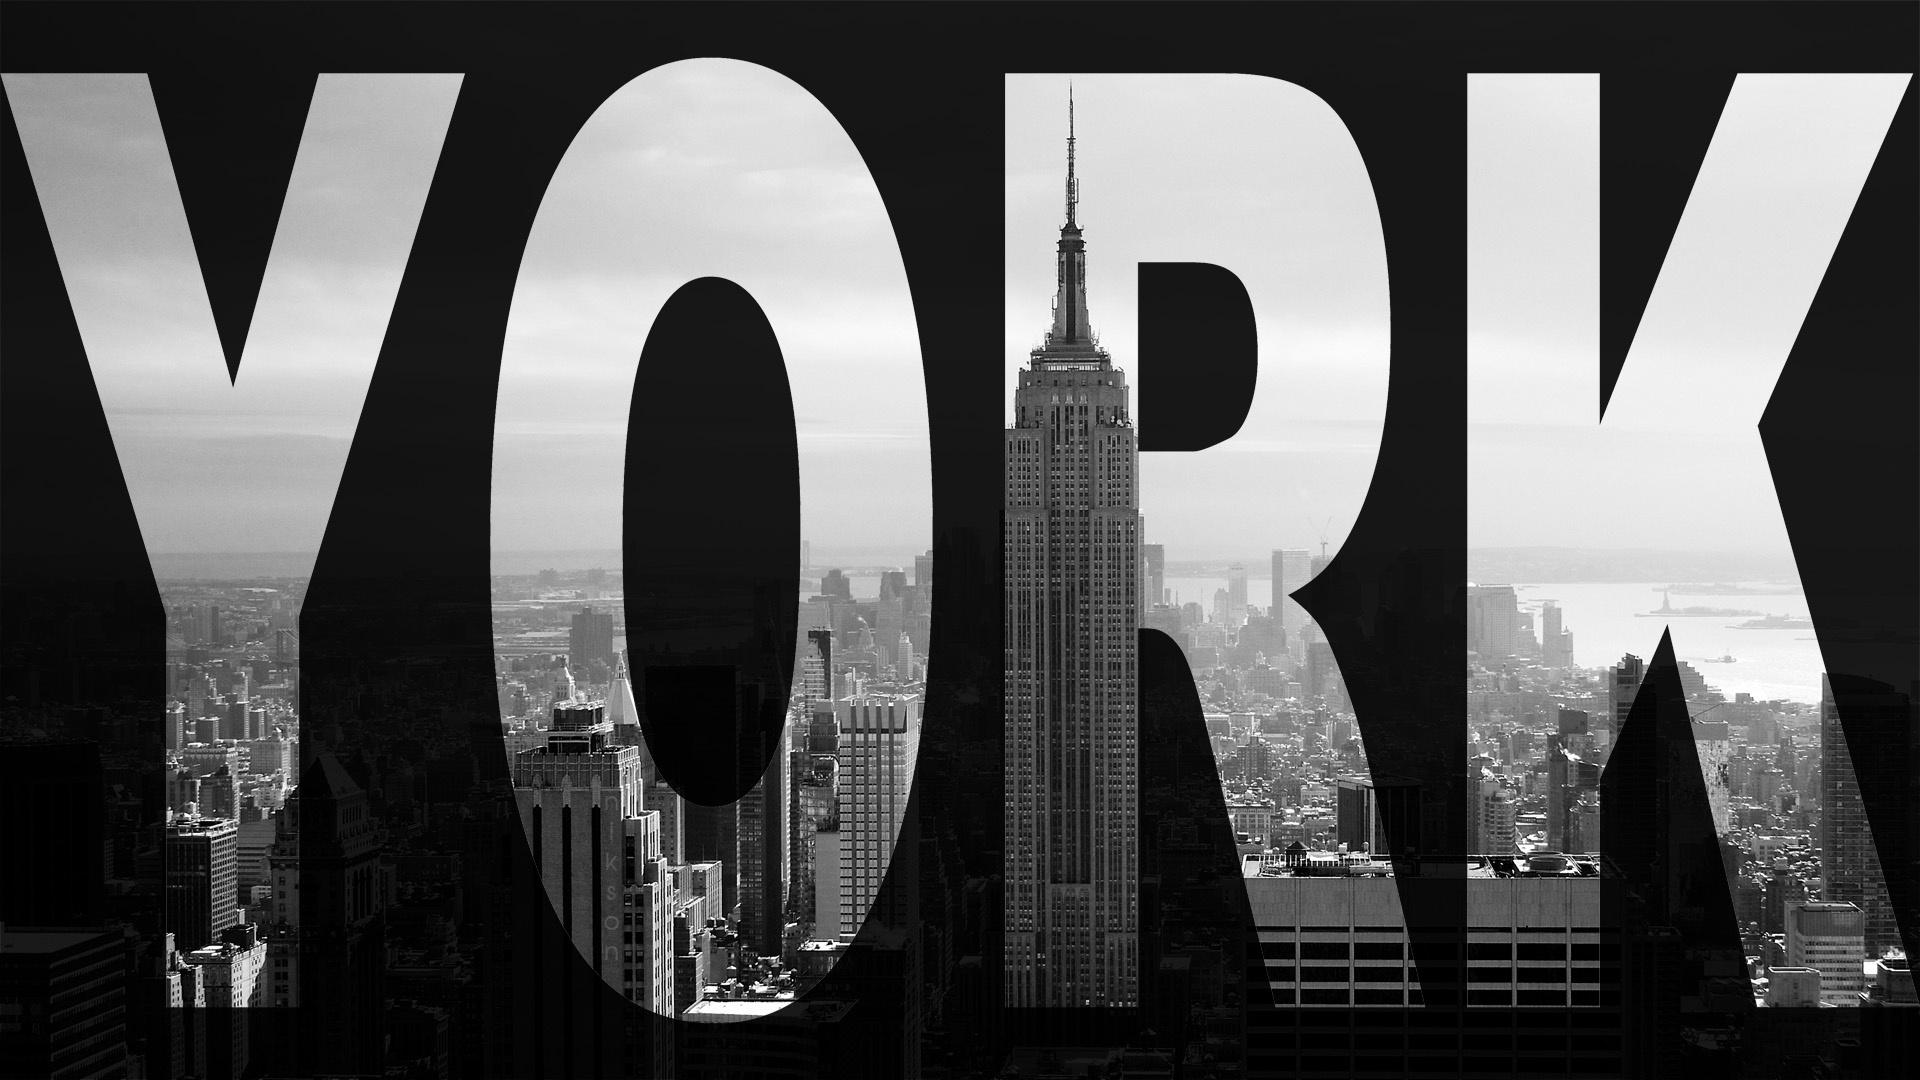 New York City Wallpaper 6312 Wallpaper Wallpaper hd 1920x1080